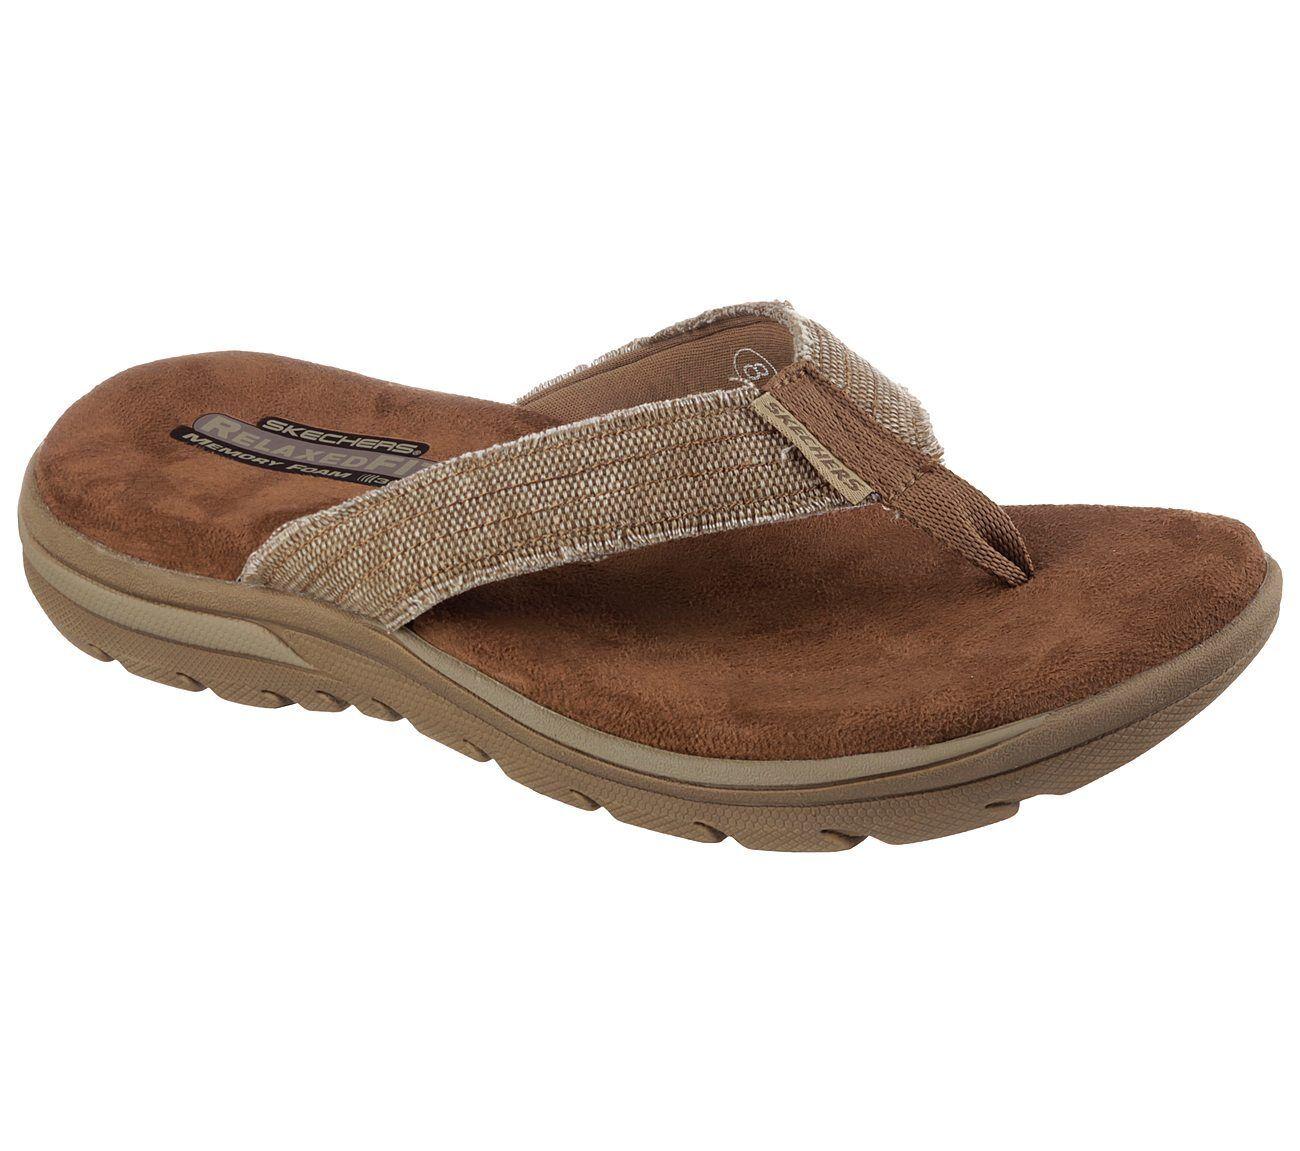 Men's Skechers Relaxed Fit: Supreme - Bosnia Sandals, 64152 /TAN Multiple Sizes